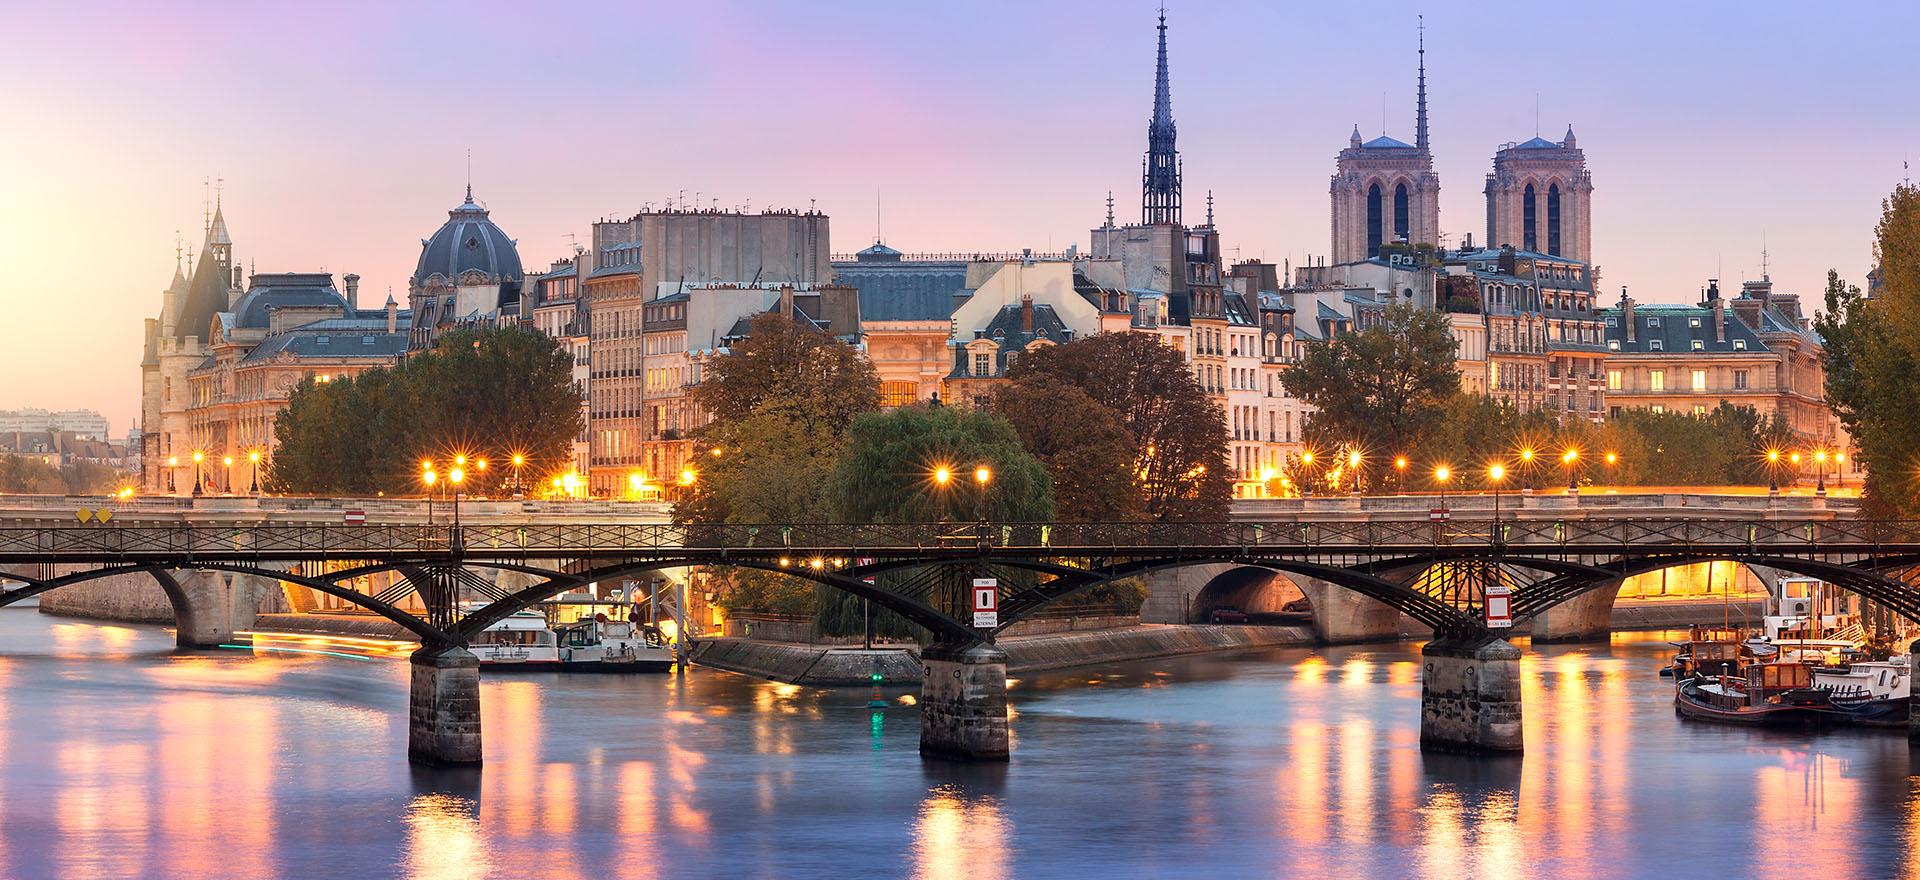 Pont de Sully bridge on the Seine river in the evening